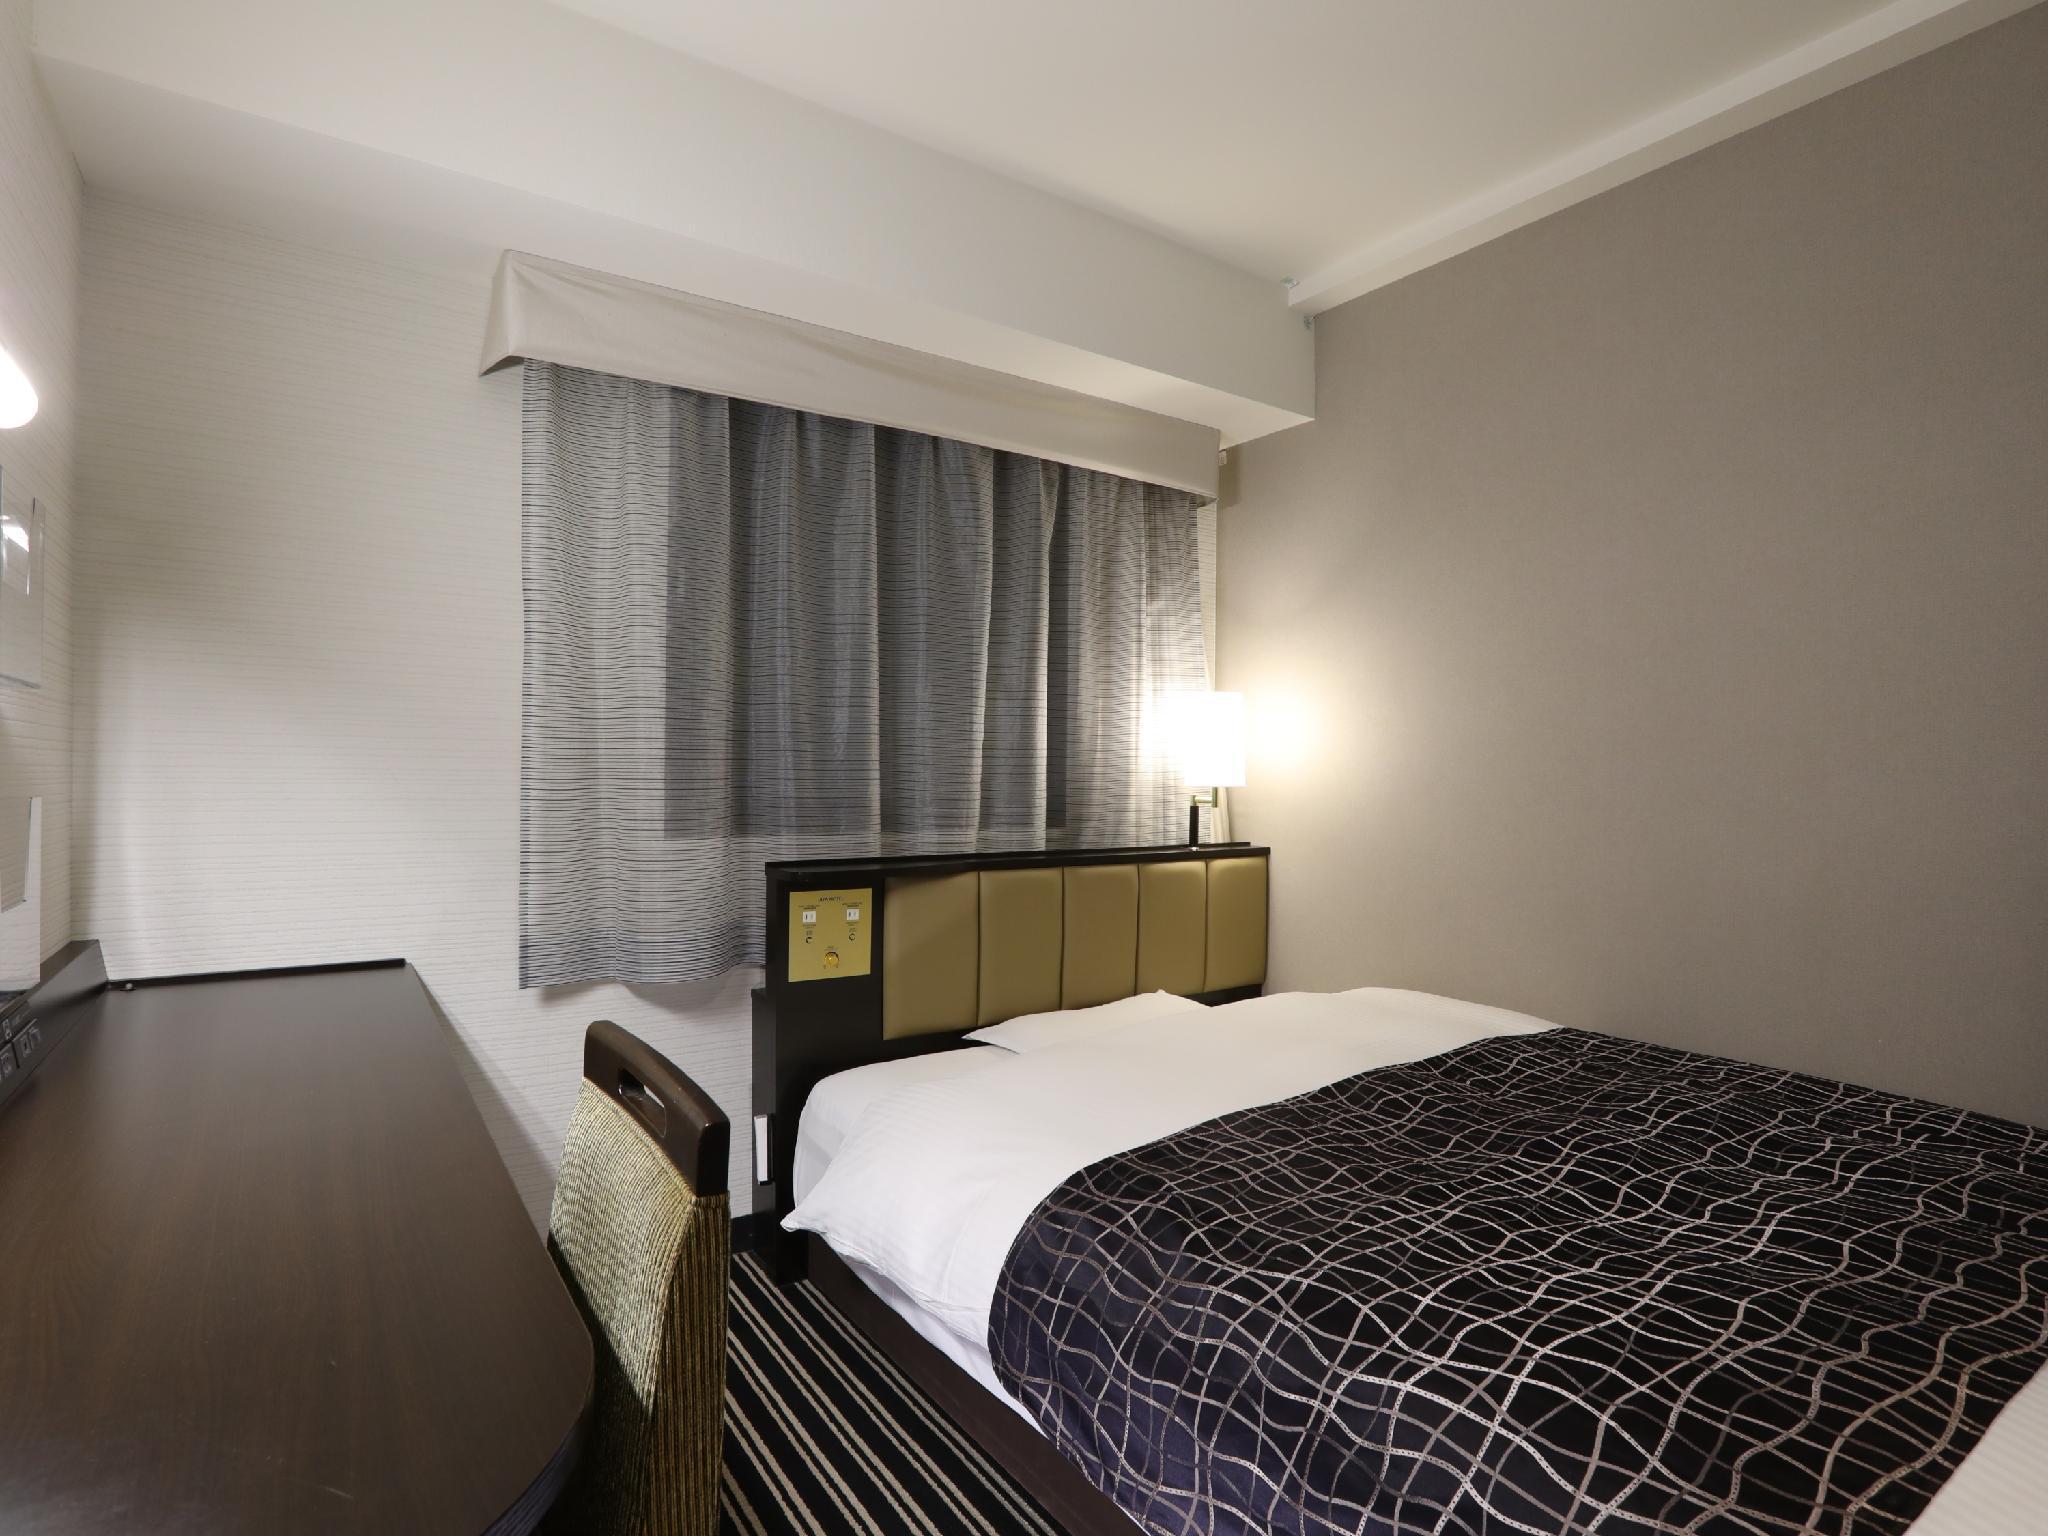 APA Hotel Kanda-Jimbocho-Ekihigashi, Chiyoda